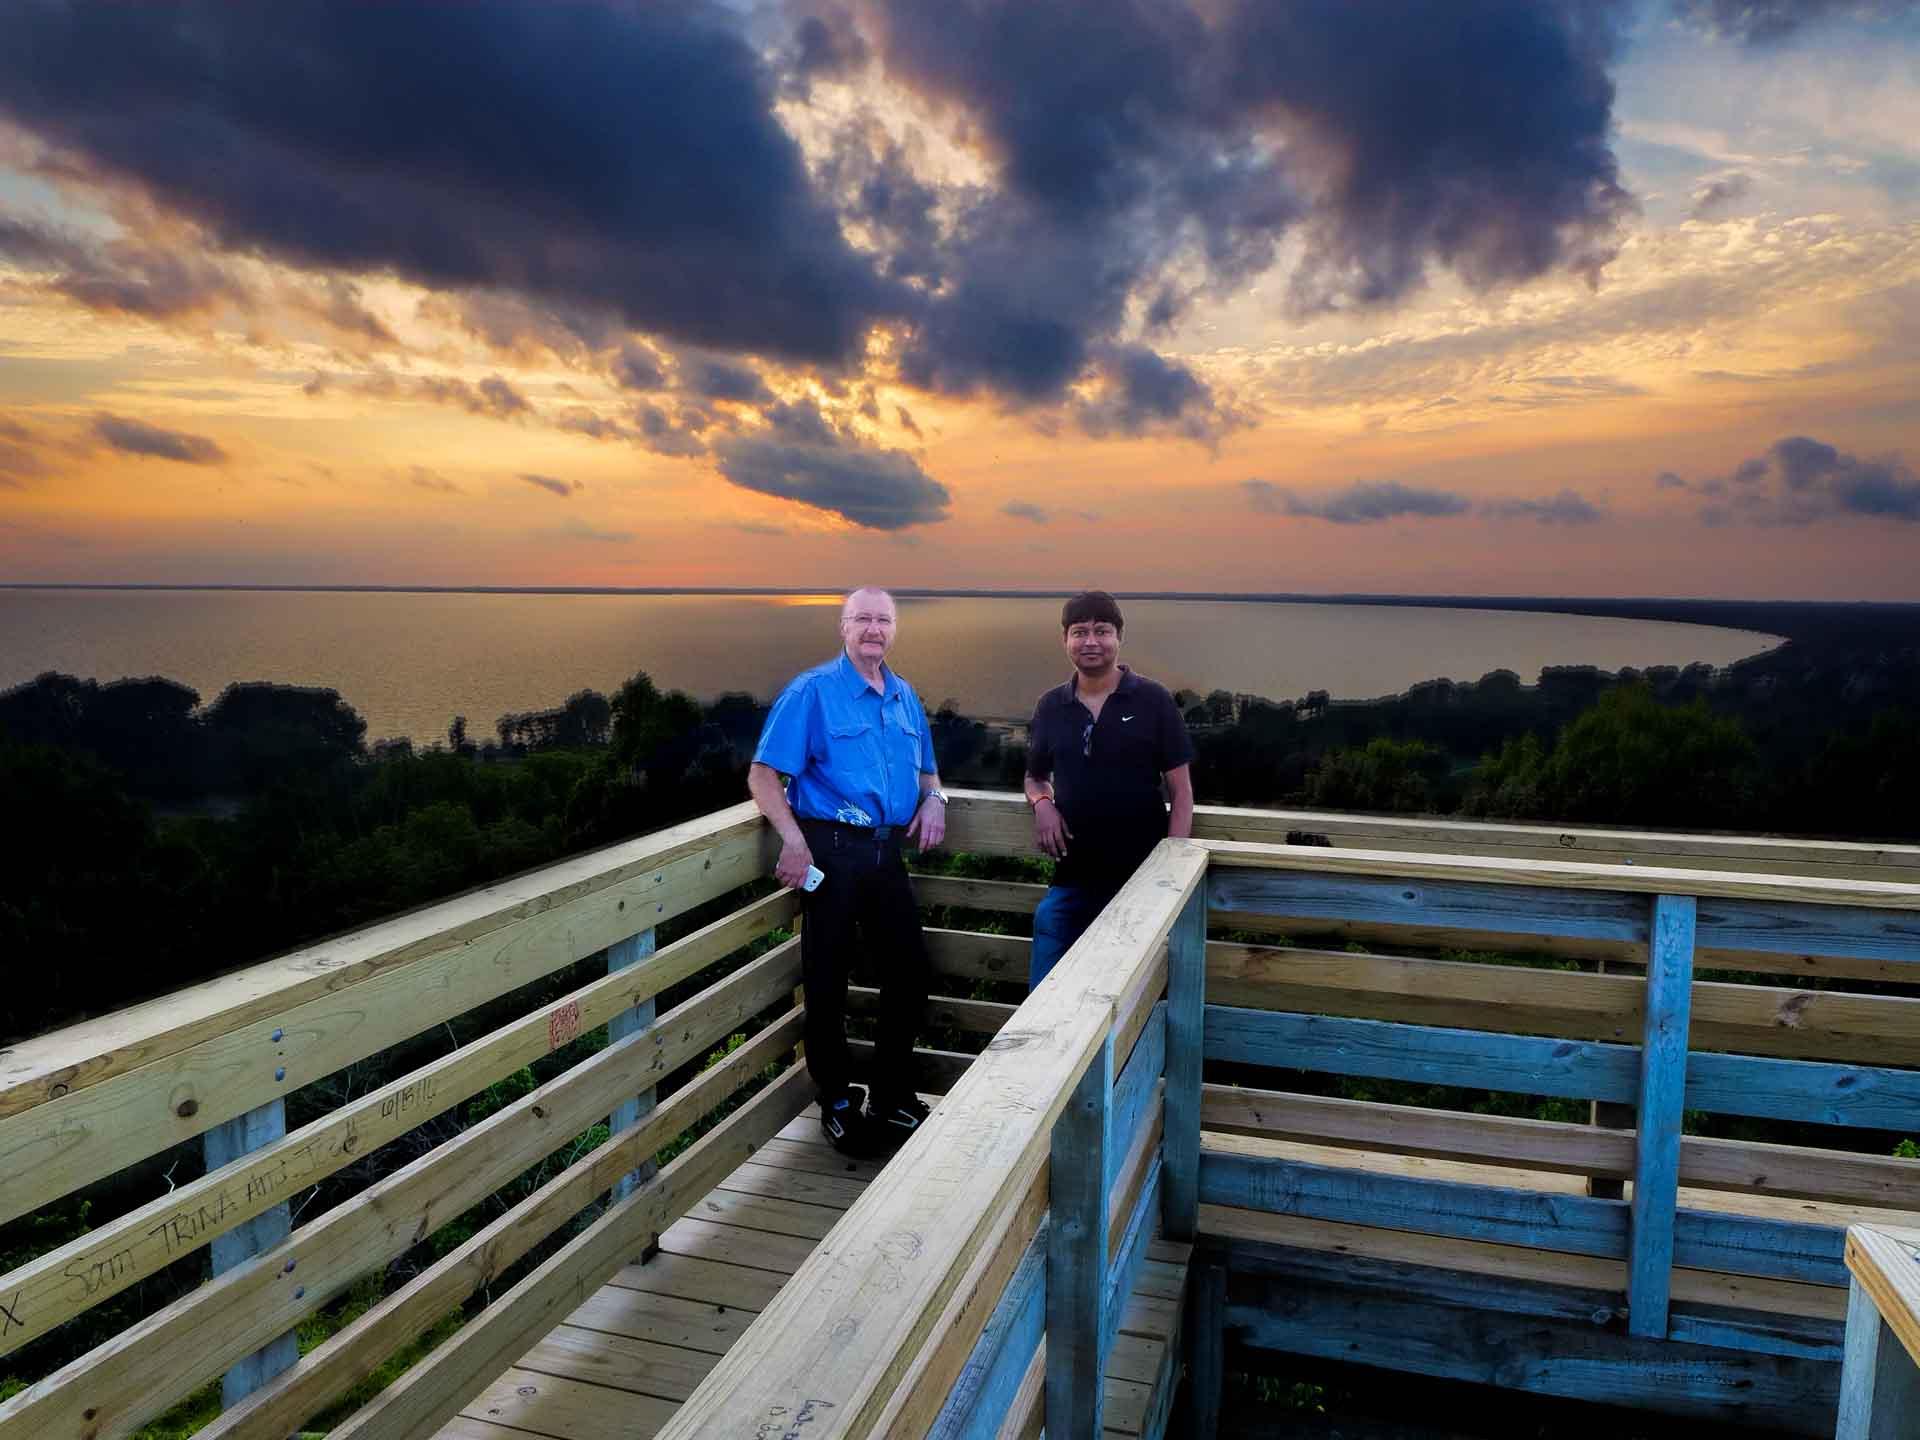 Max and Saurab at High Cliff Sunset